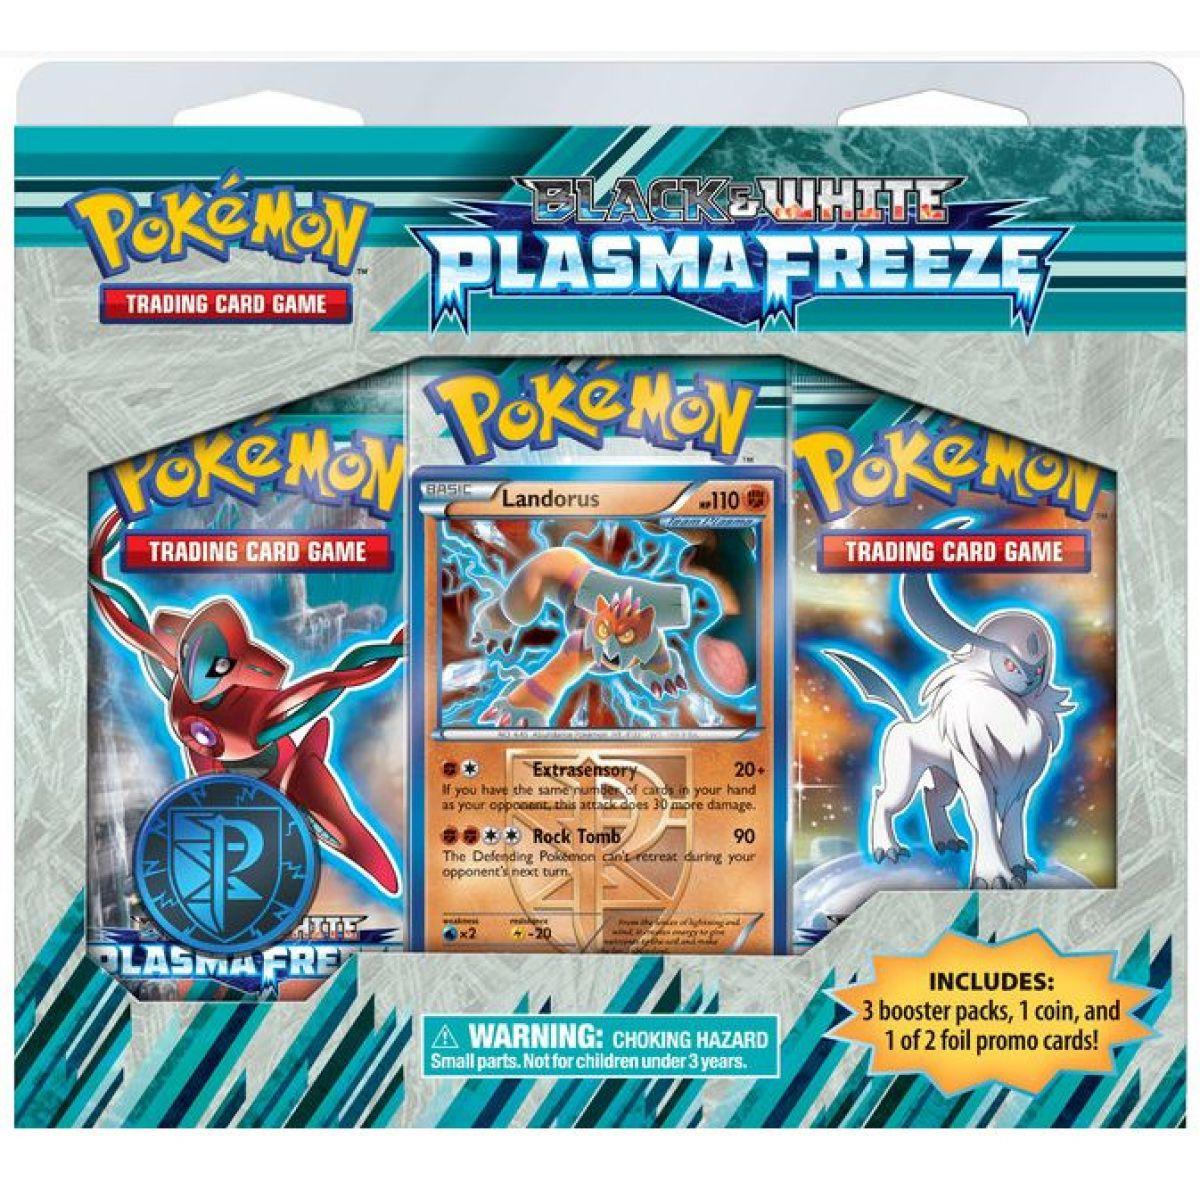 Pokémon: BW9 Plasma Freeze - 3 Pack Blister